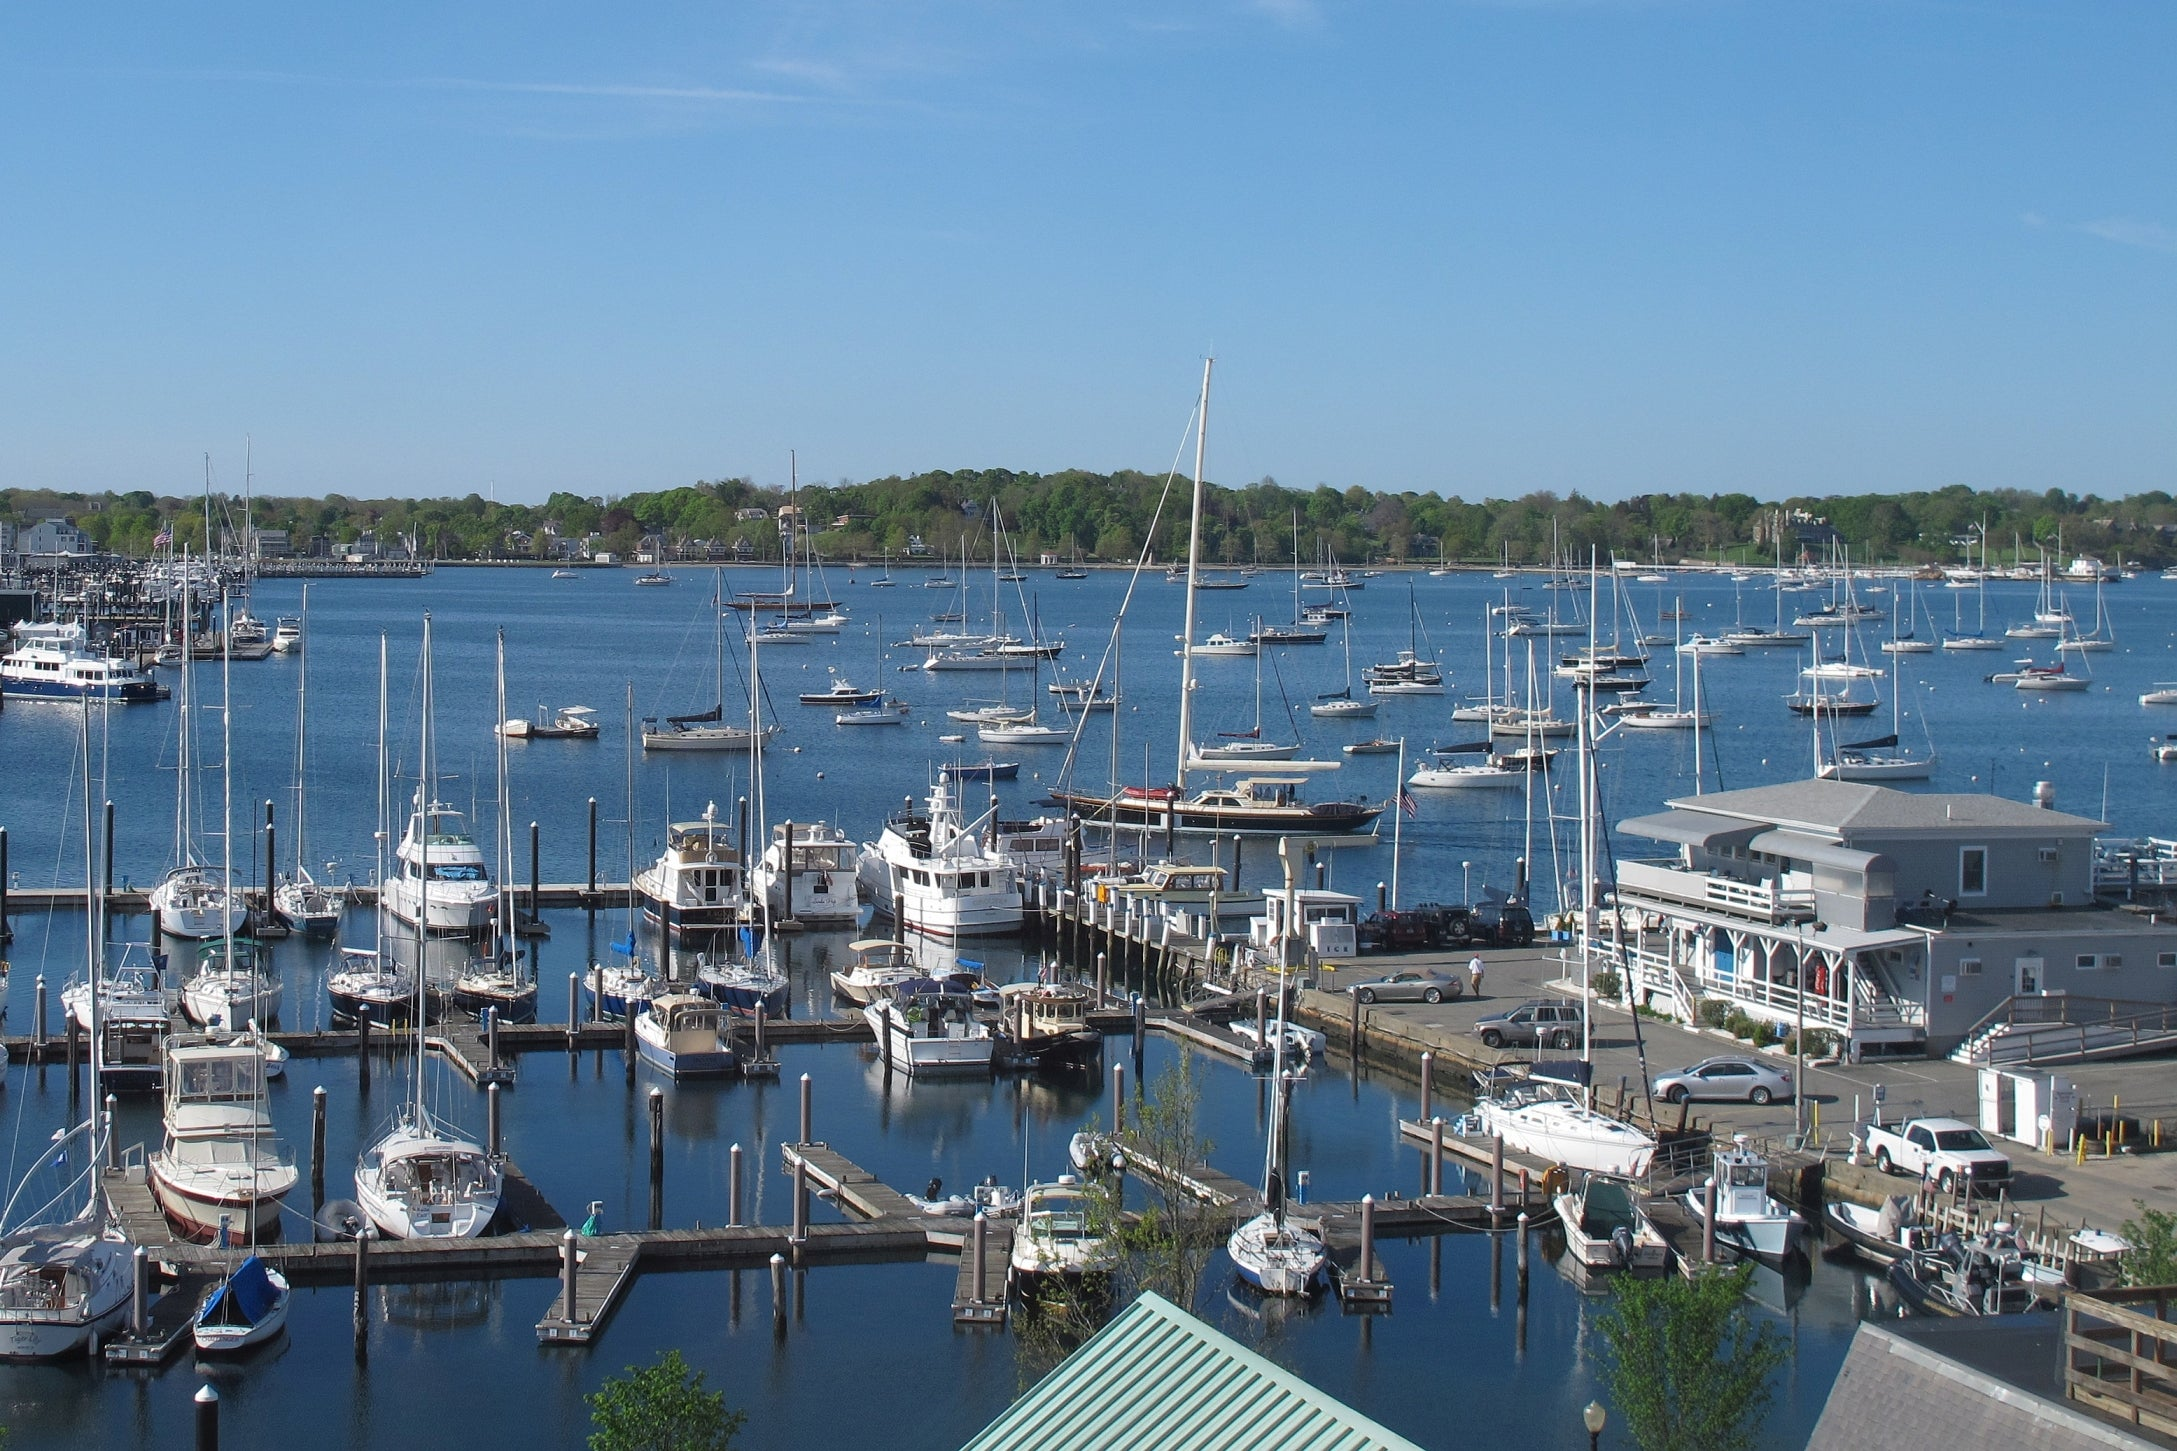 You can book a sailboat tour of Newport Harbor.